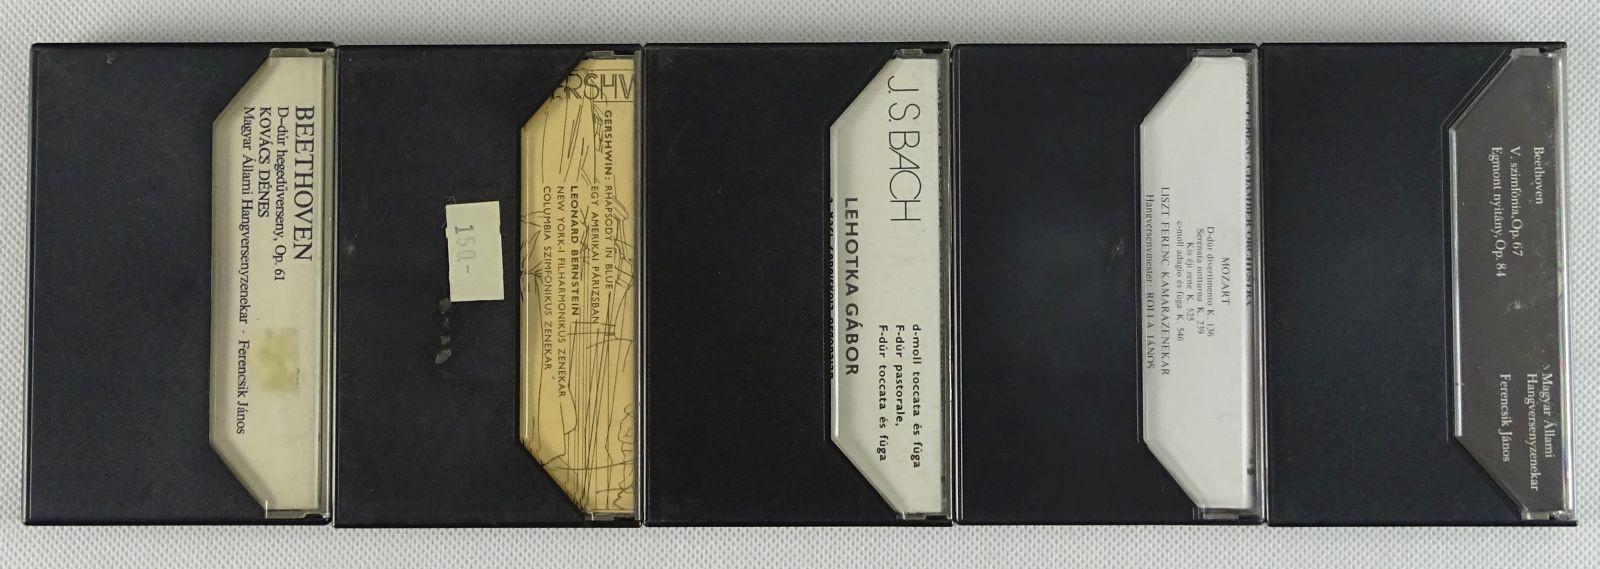 DSC03297.JPG (1600×569)